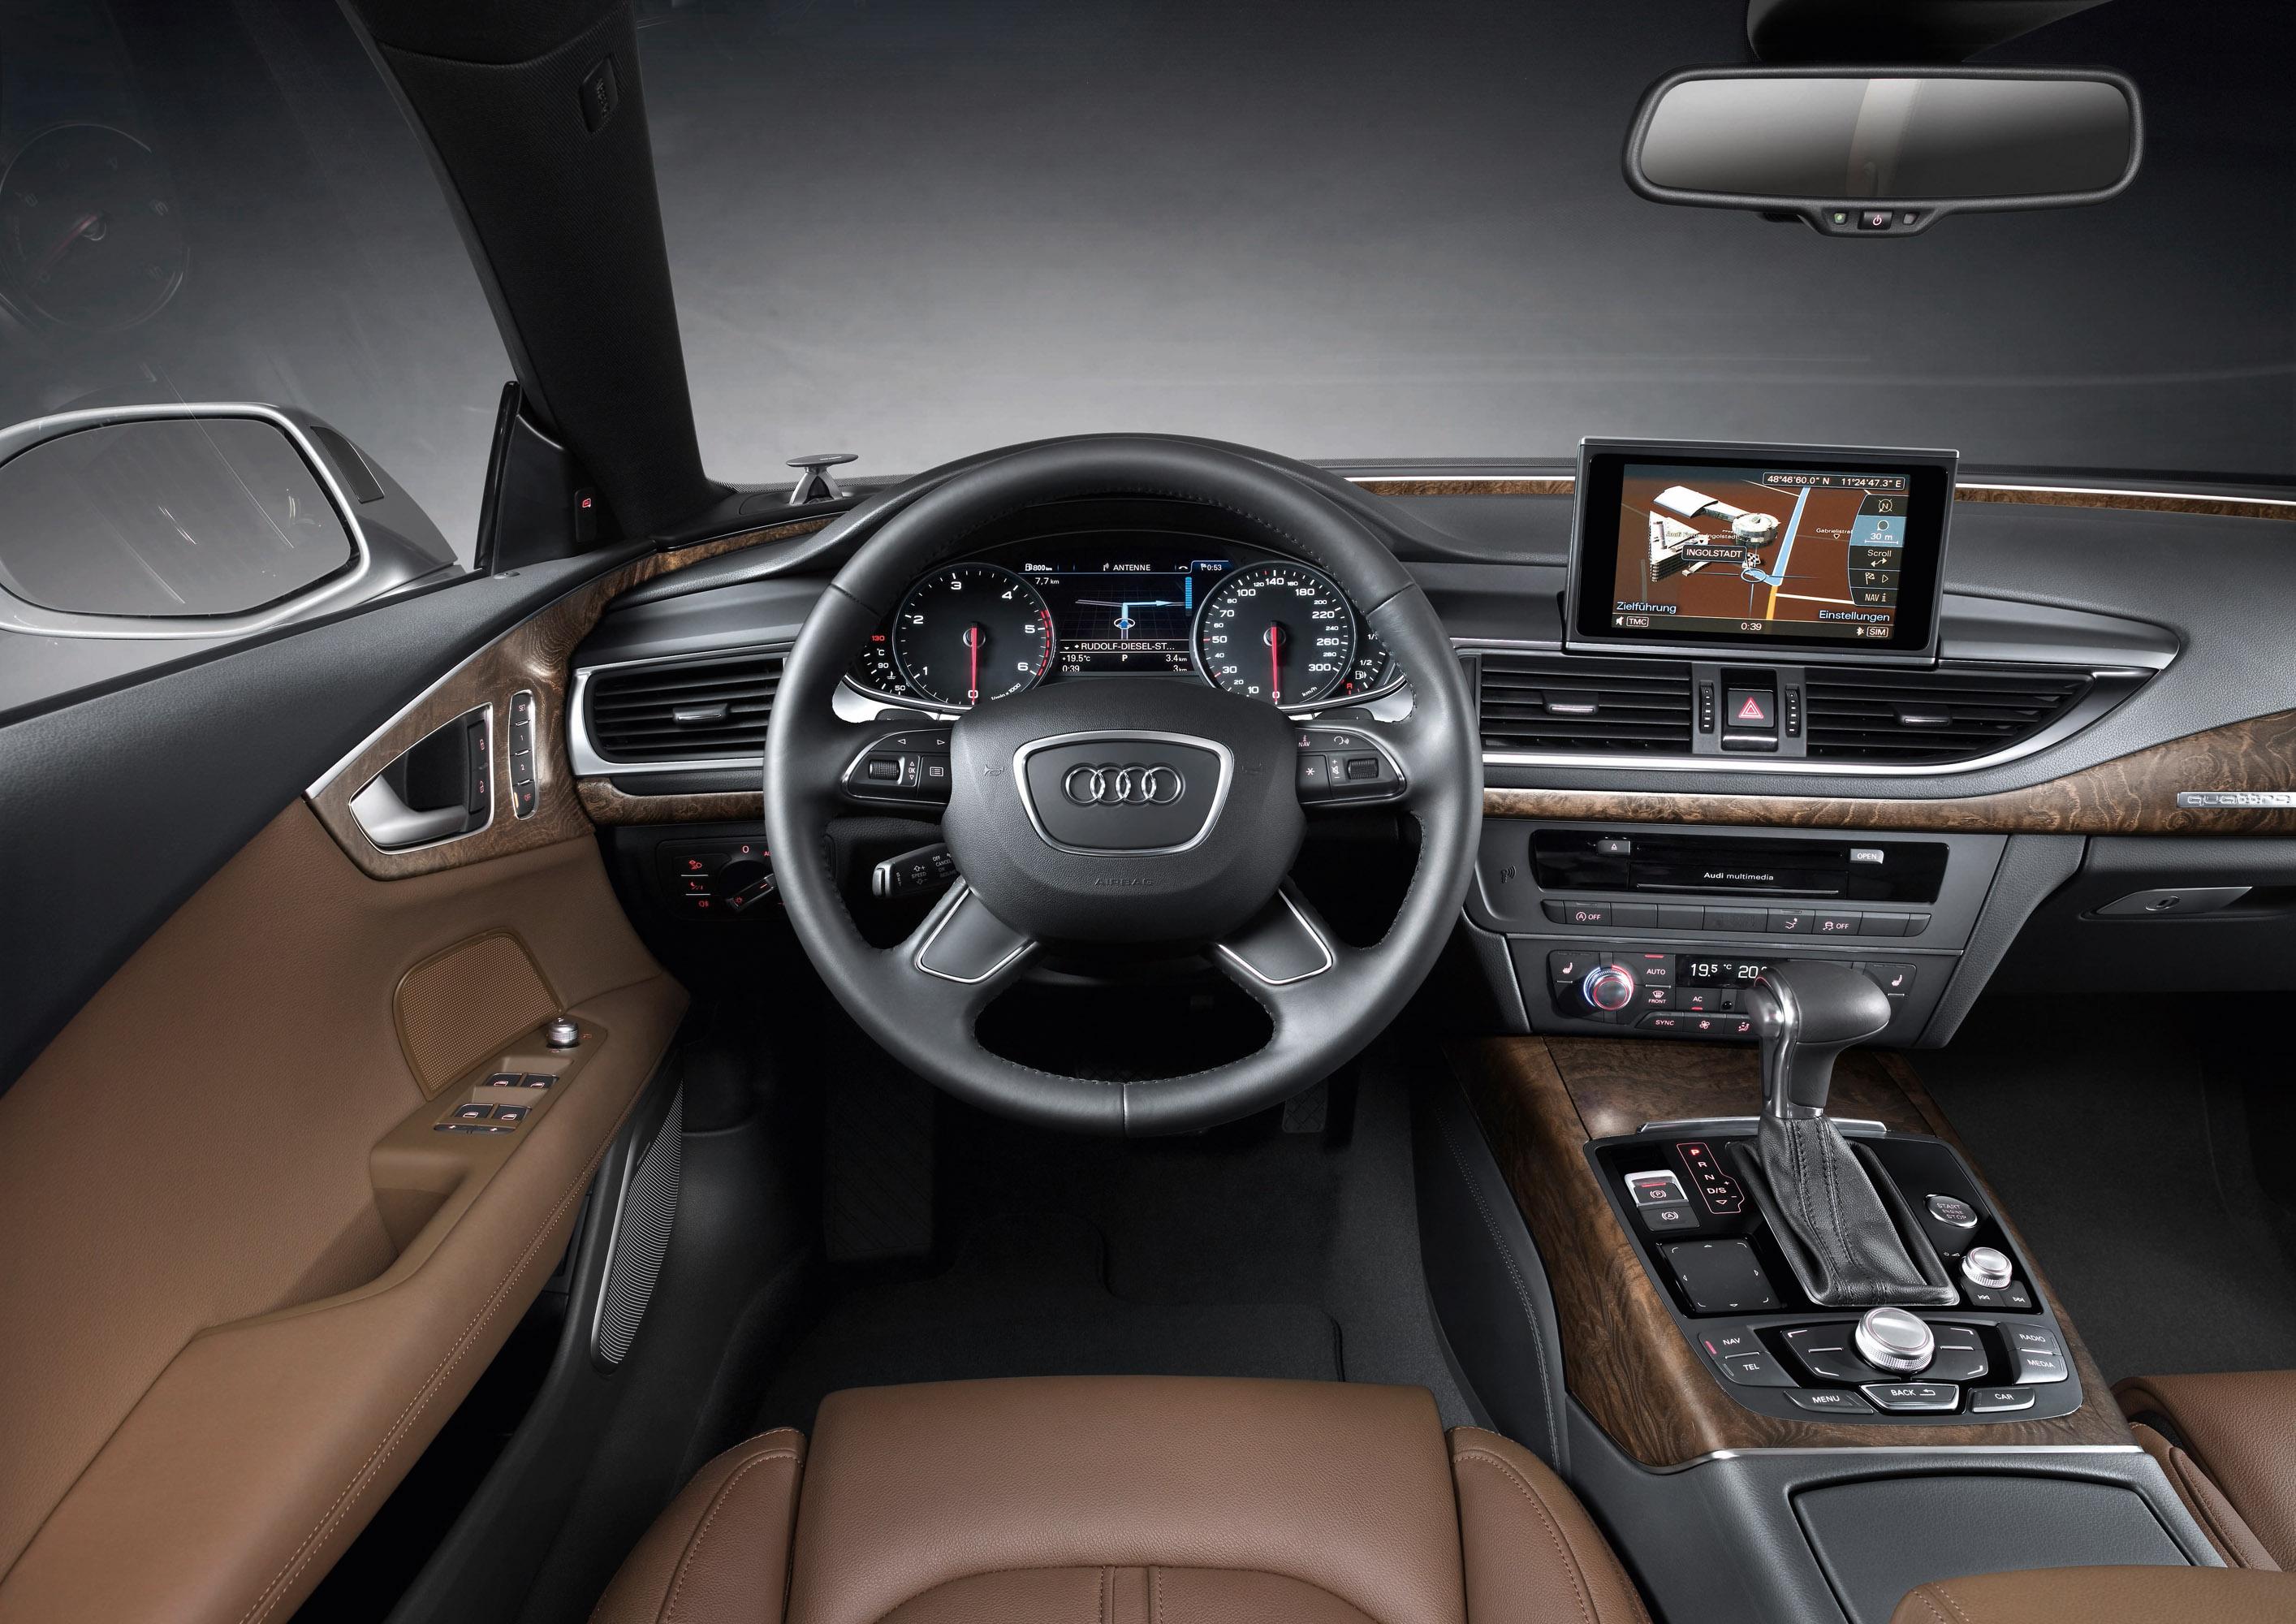 2011 Audi A7 Sportback - Picture 40526